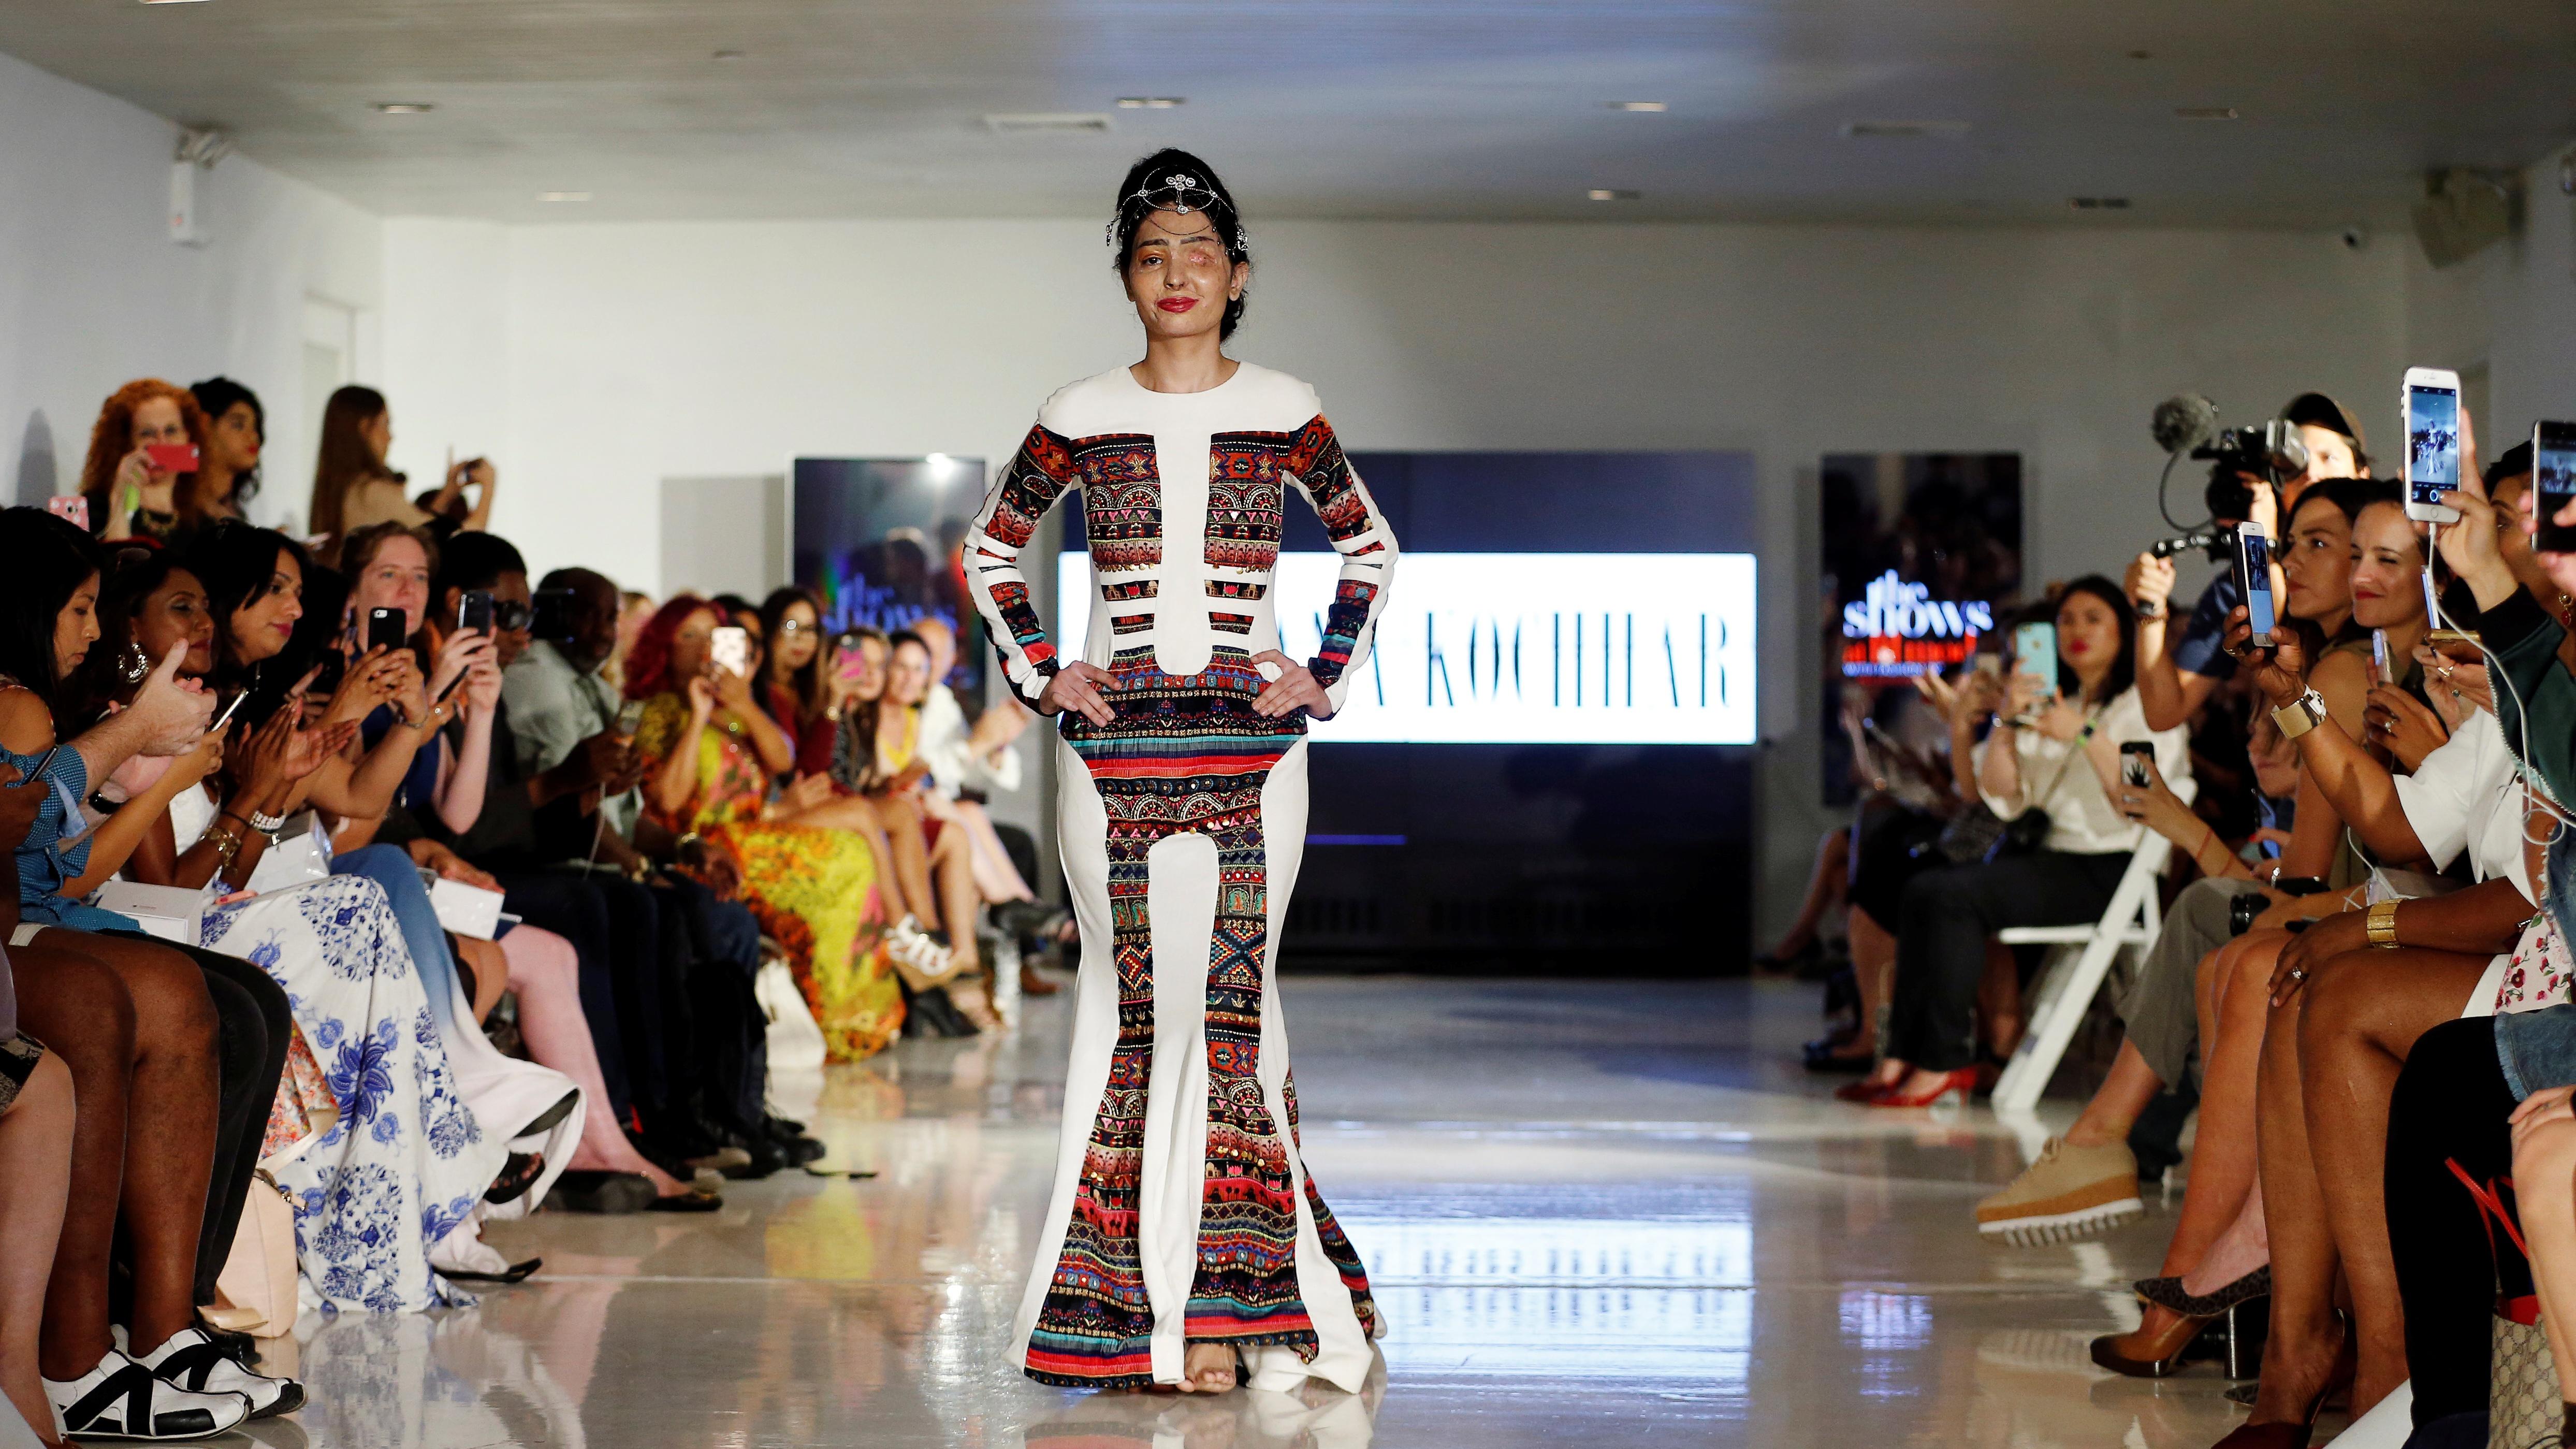 Photos Indian Acid Attack Survivor Reshma Qureshi Made Her Triumphant Runway Debut At New York Fashion Week Quartz